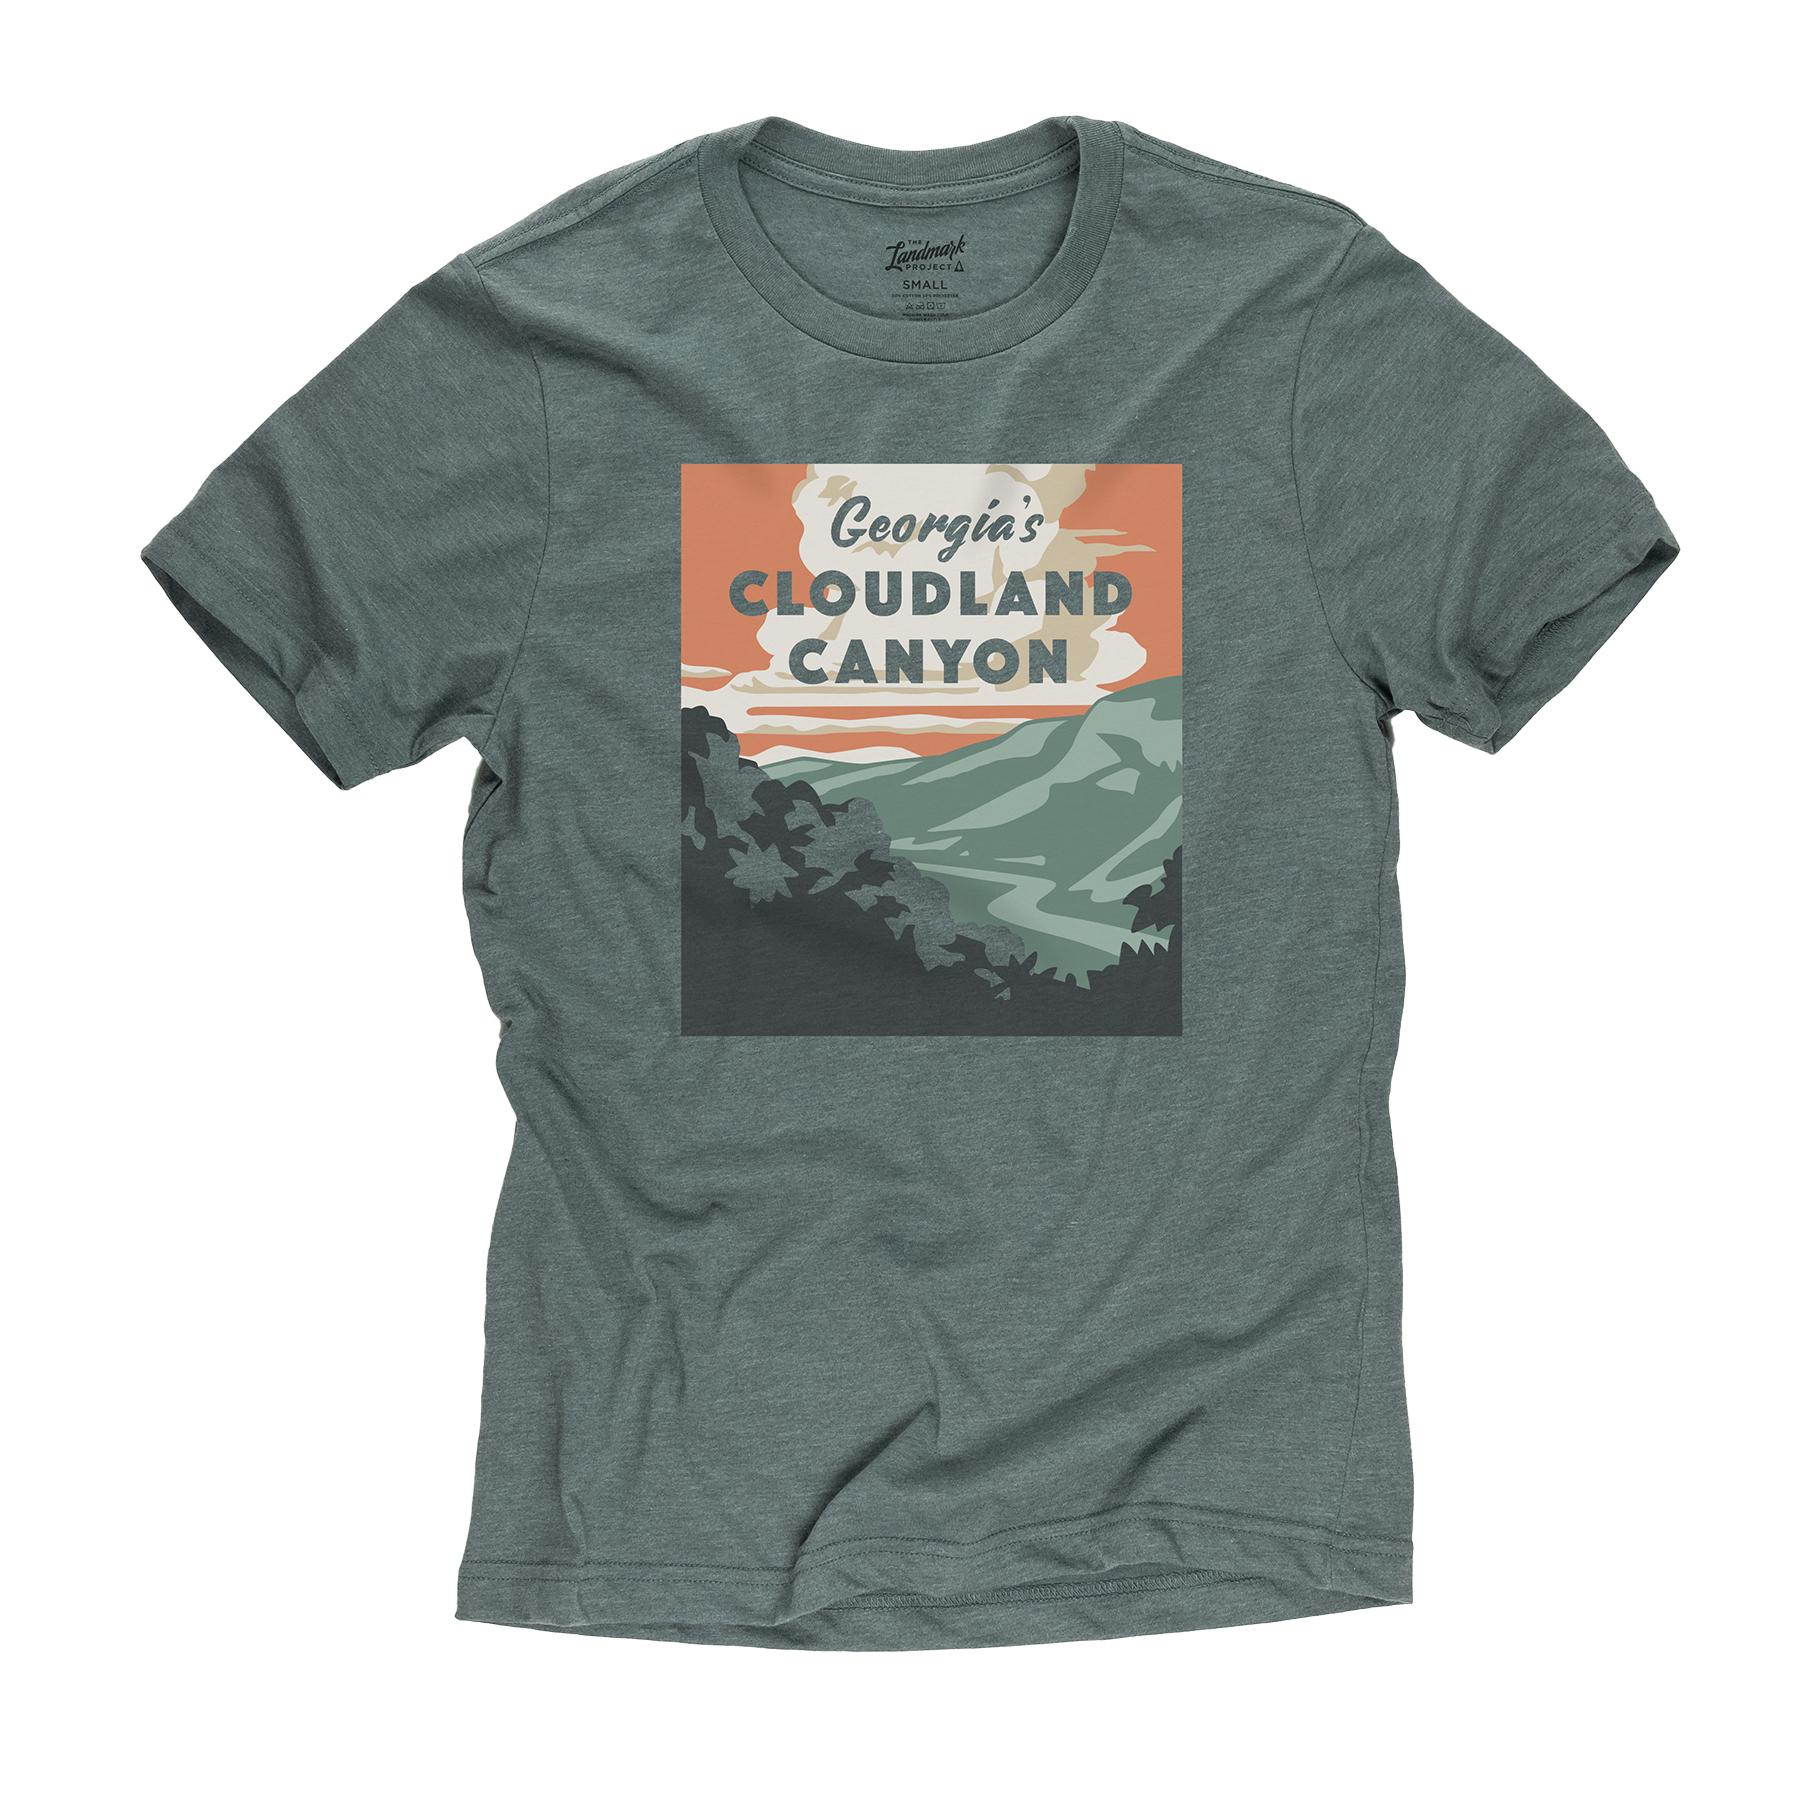 Cloudland canyon mockup.jpg